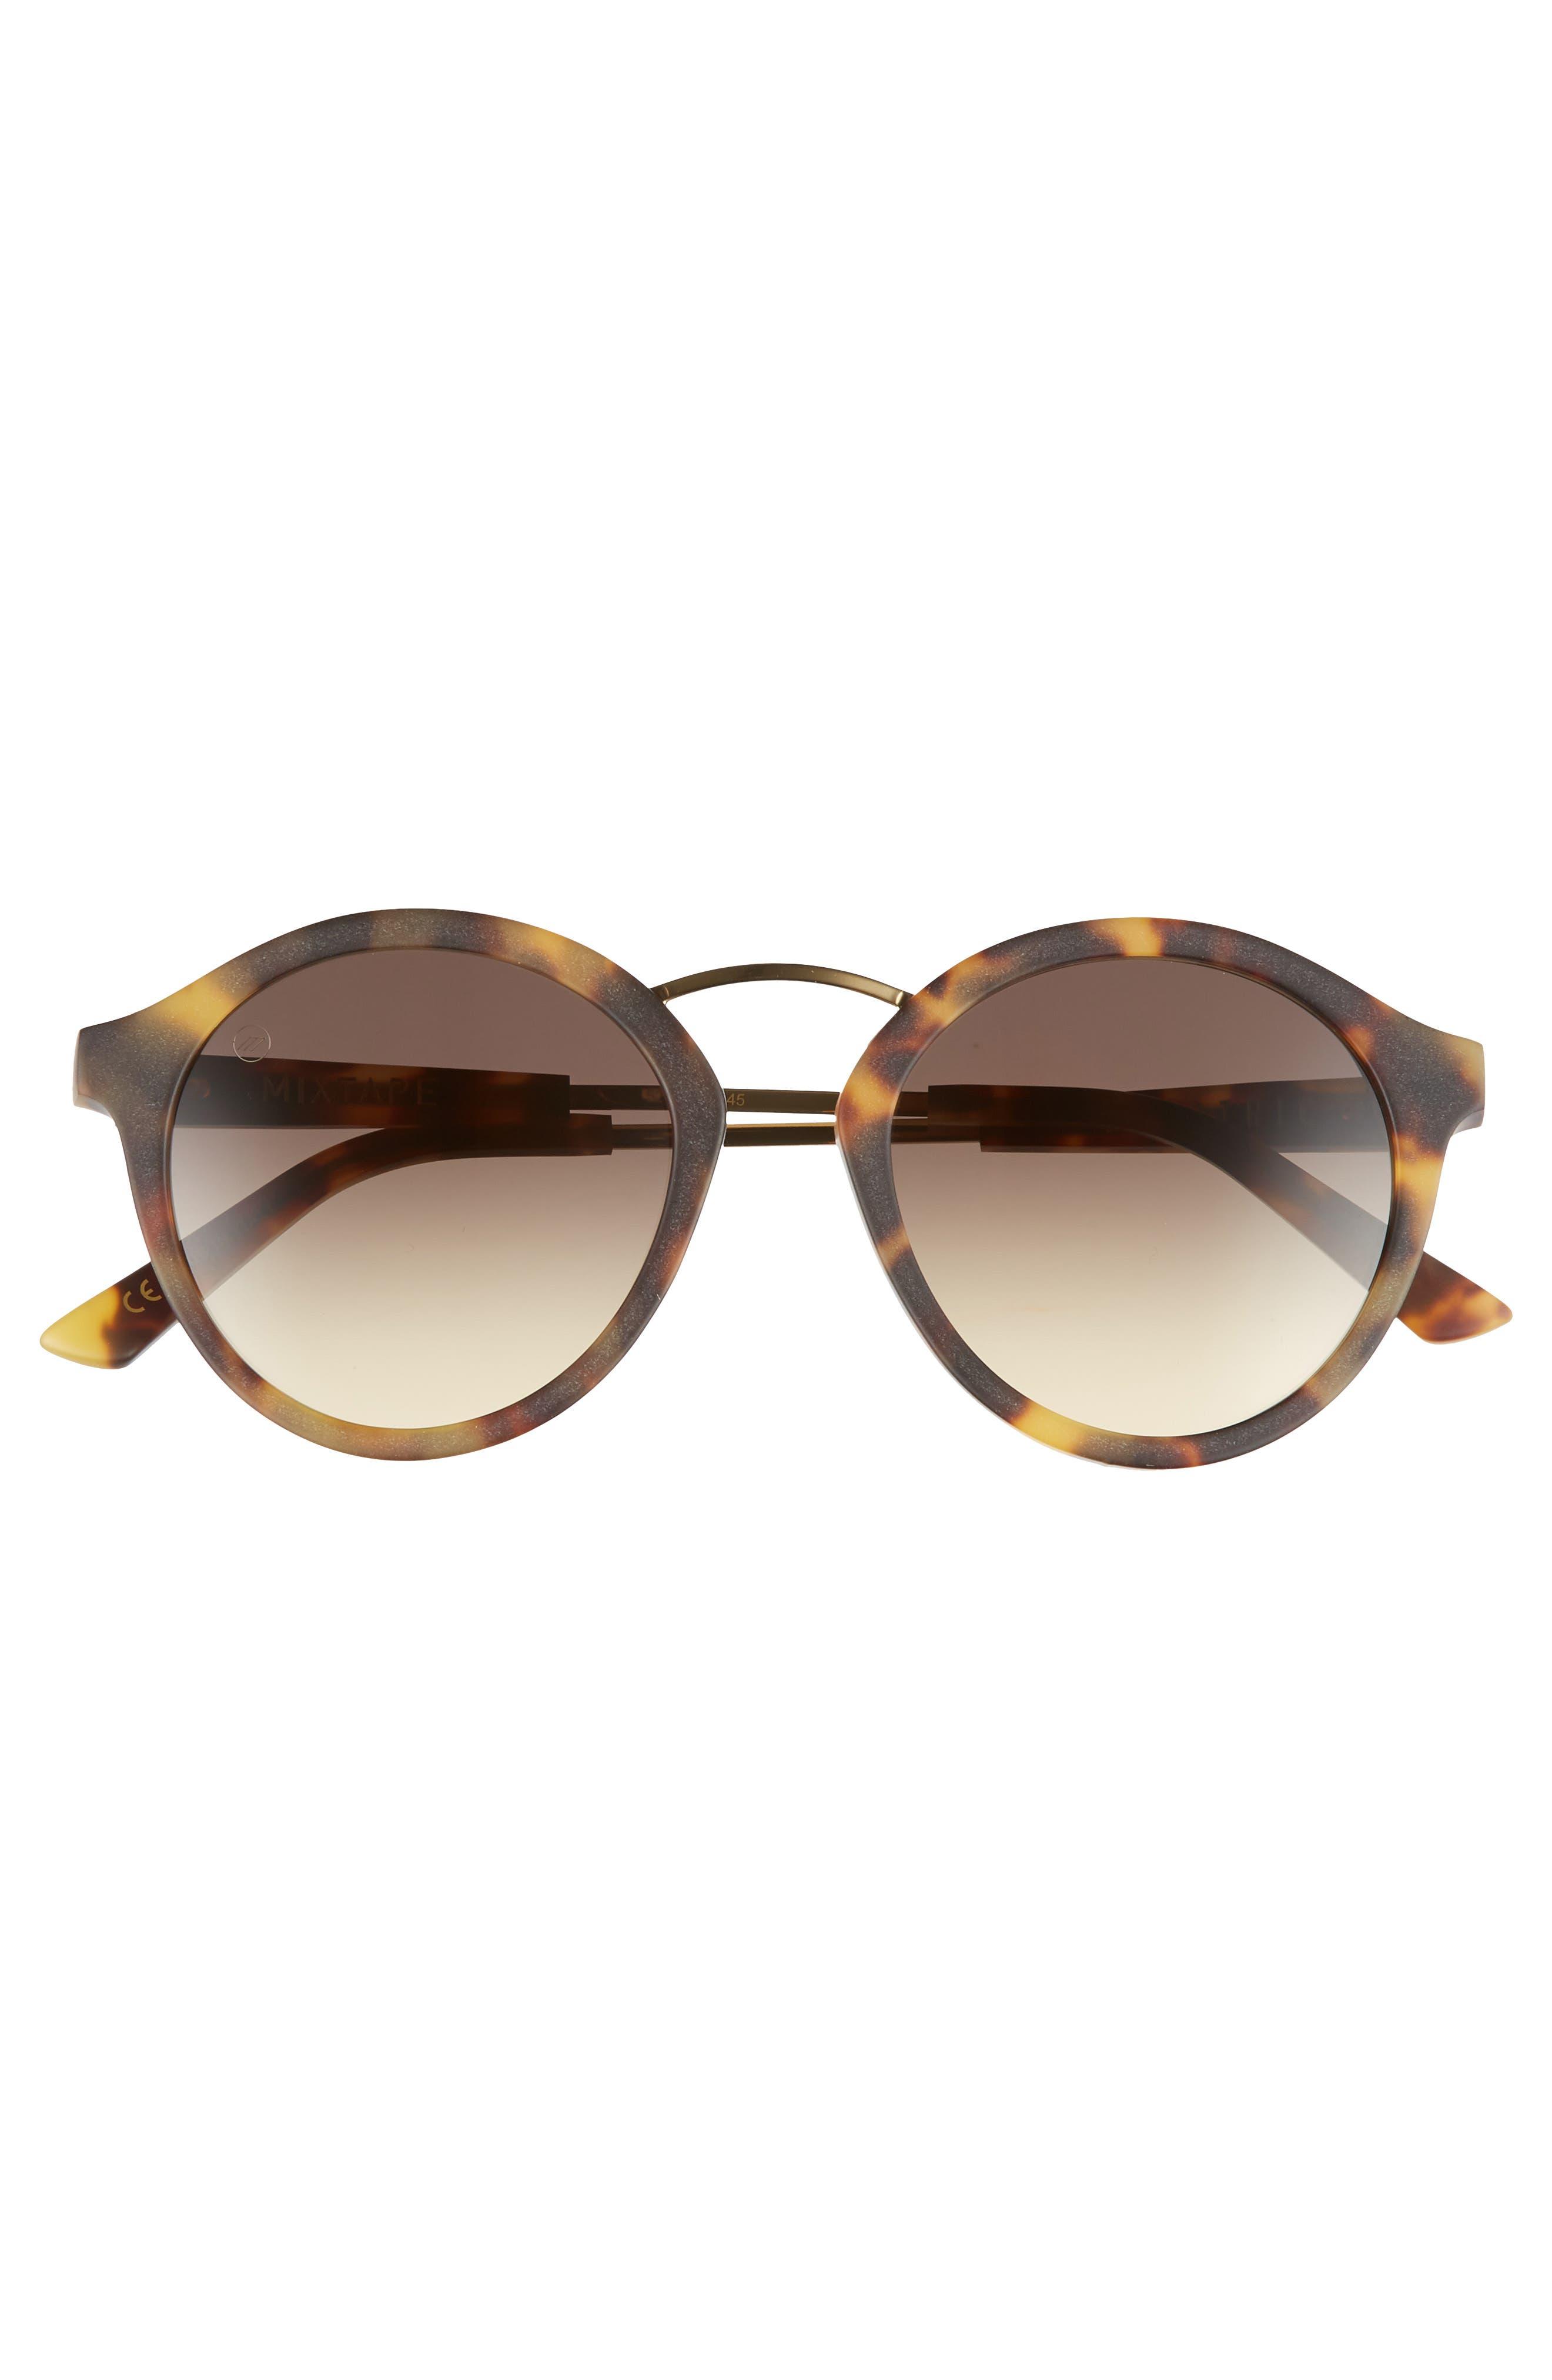 Mix Tape 52mm Mirrored Round Sunglasses,                             Alternate thumbnail 3, color,                             MATTE TORTOISE/ BLACK GRADIENT